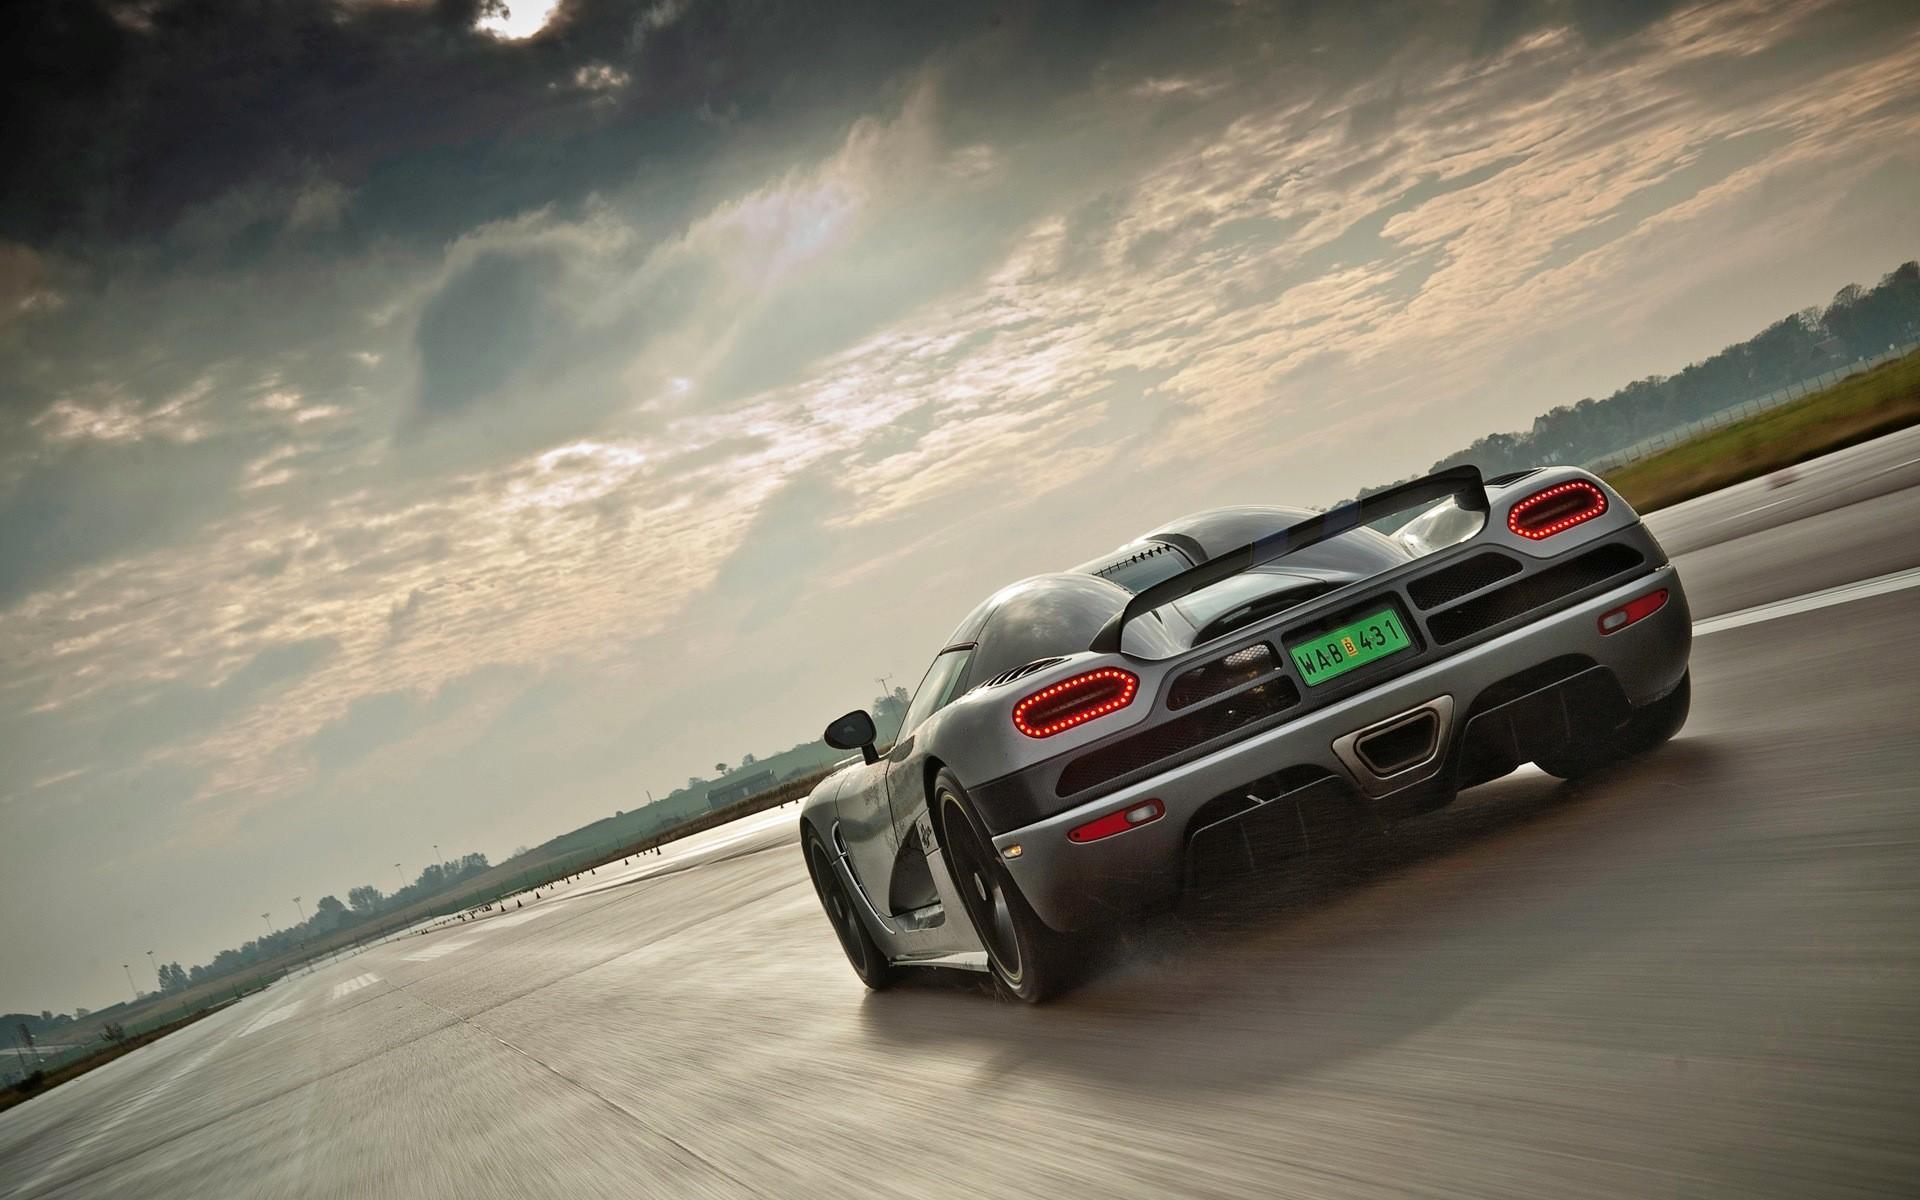 Fondos De Pantalla Vehiculo Coche Deportivo Koenigsegg Agera